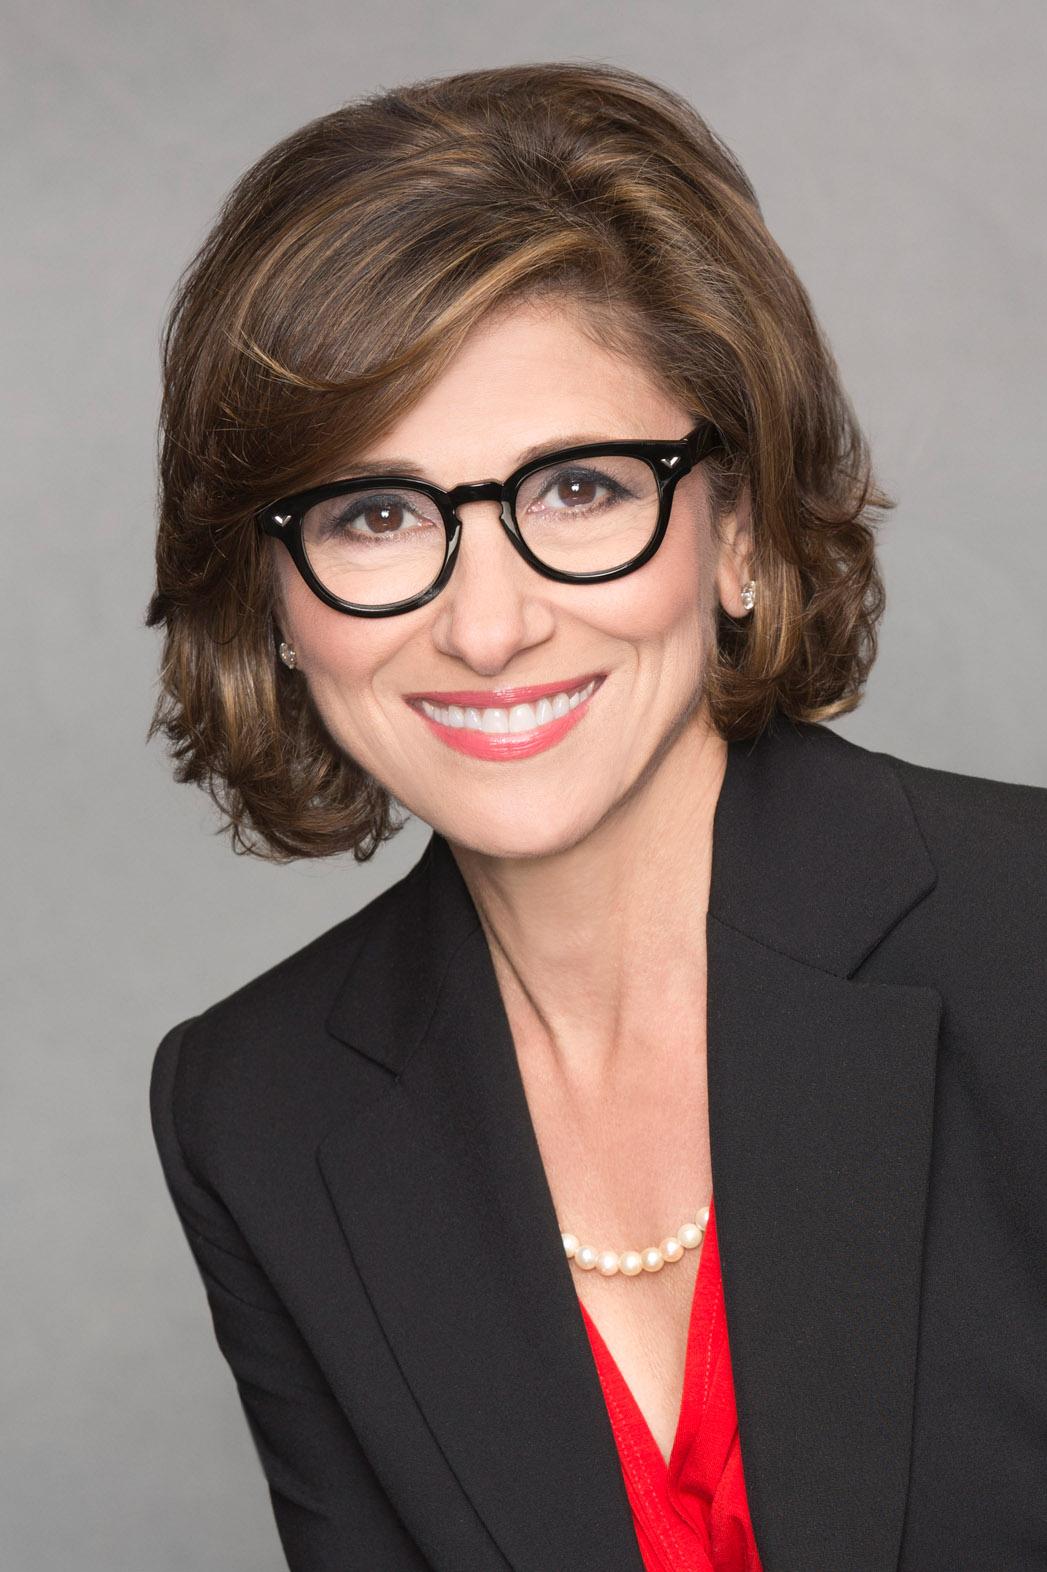 Nina Tassler Headshot - P 2014